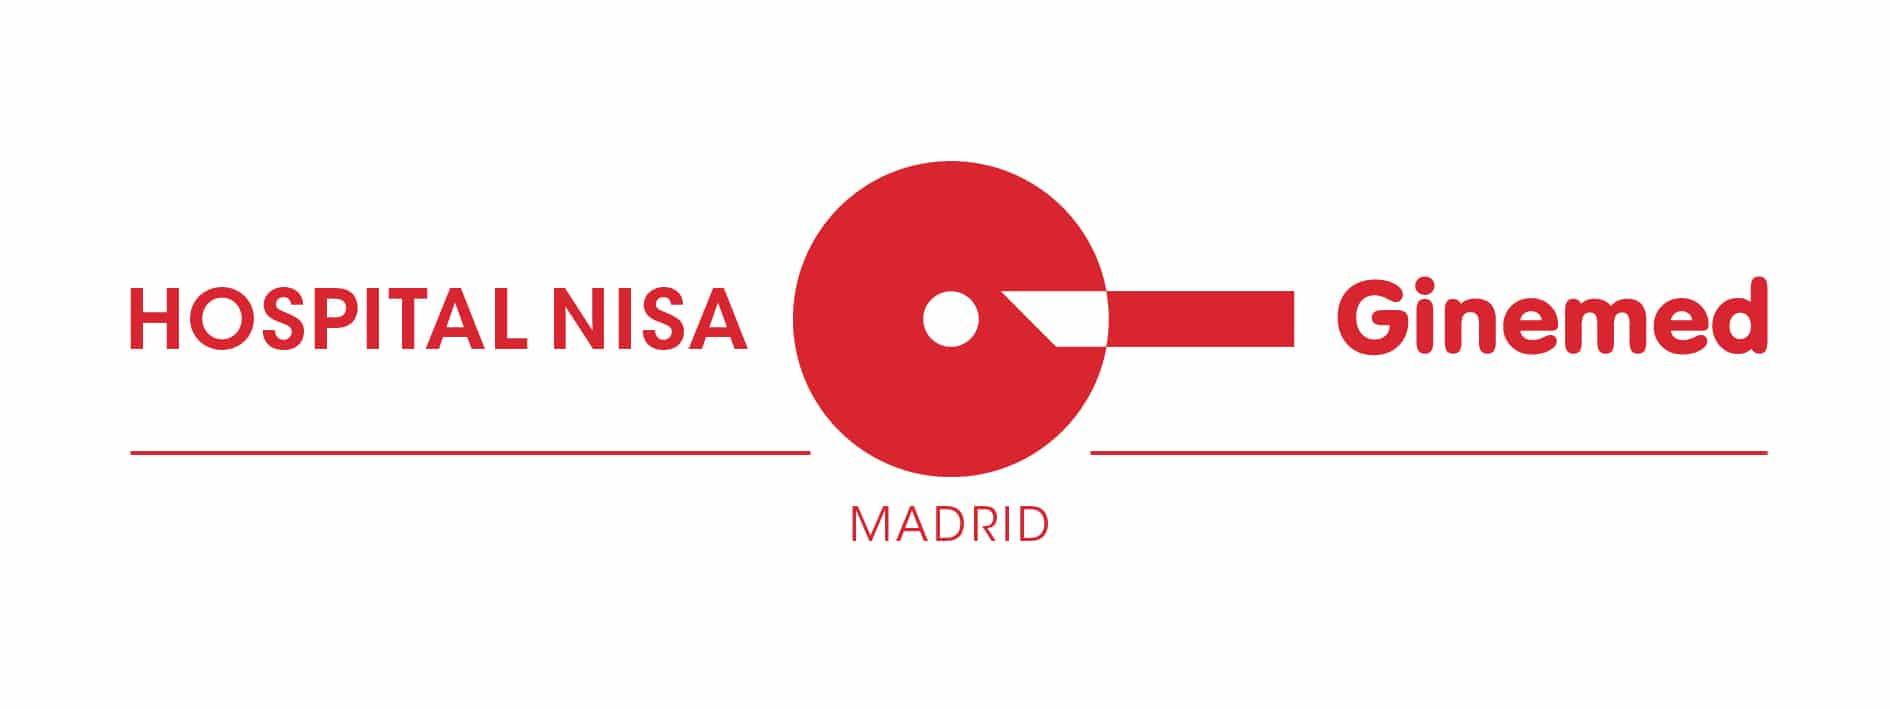 Logotipo Hospital NISA Ginemed Madrid